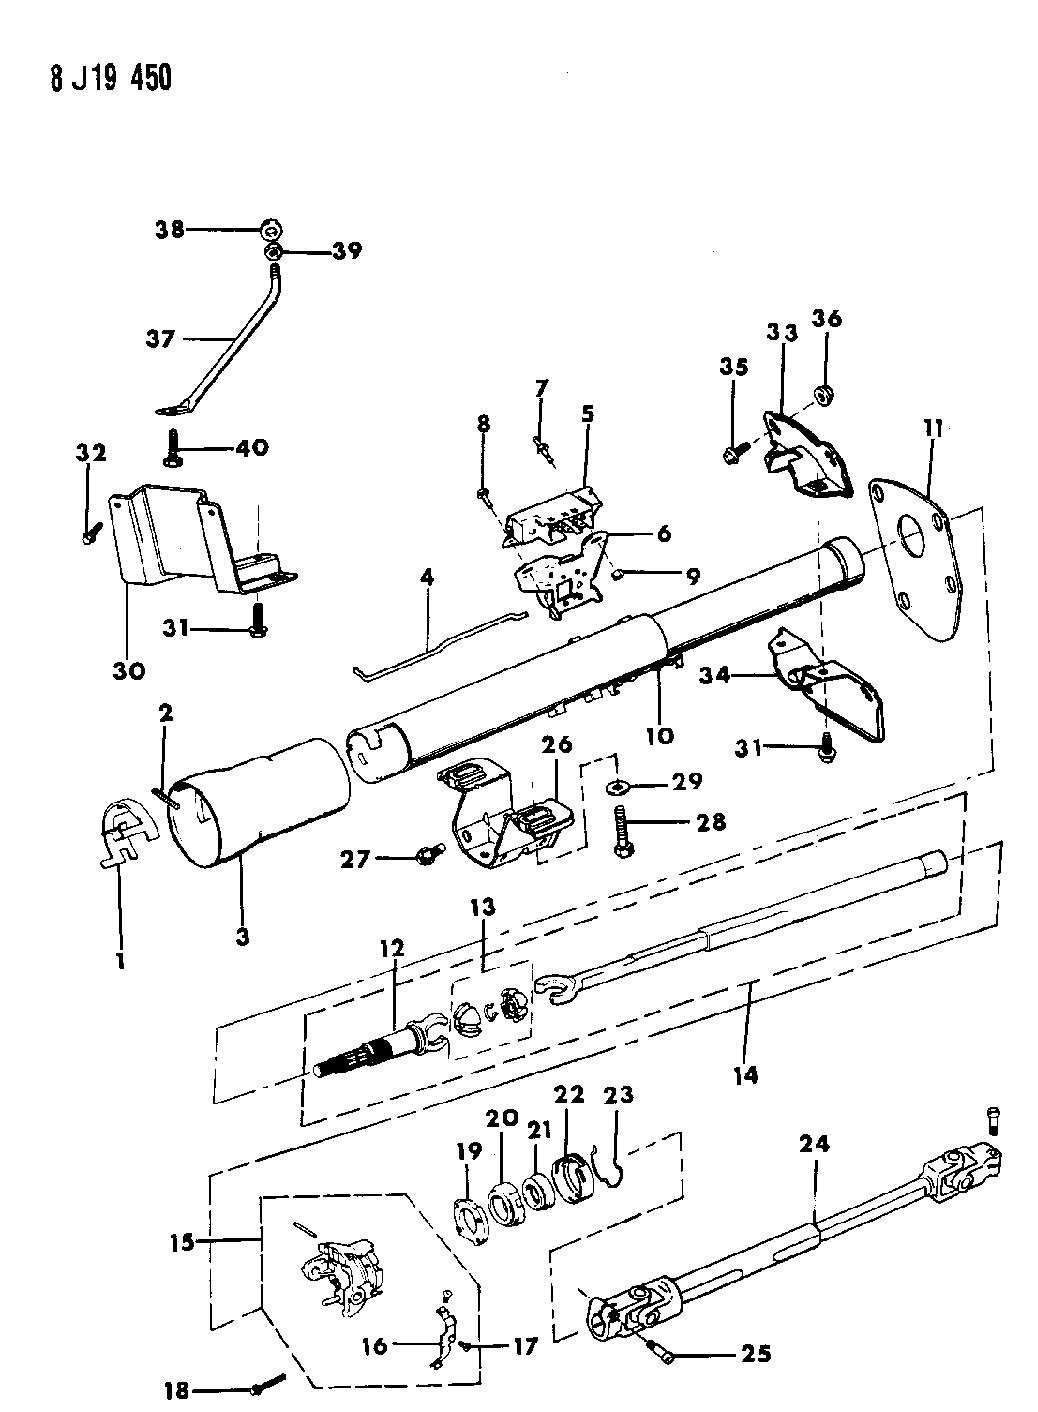 Wiring Diagrams Pdf Furthermore 1984 Jeep Cj7 Ignition Wiring Diagram